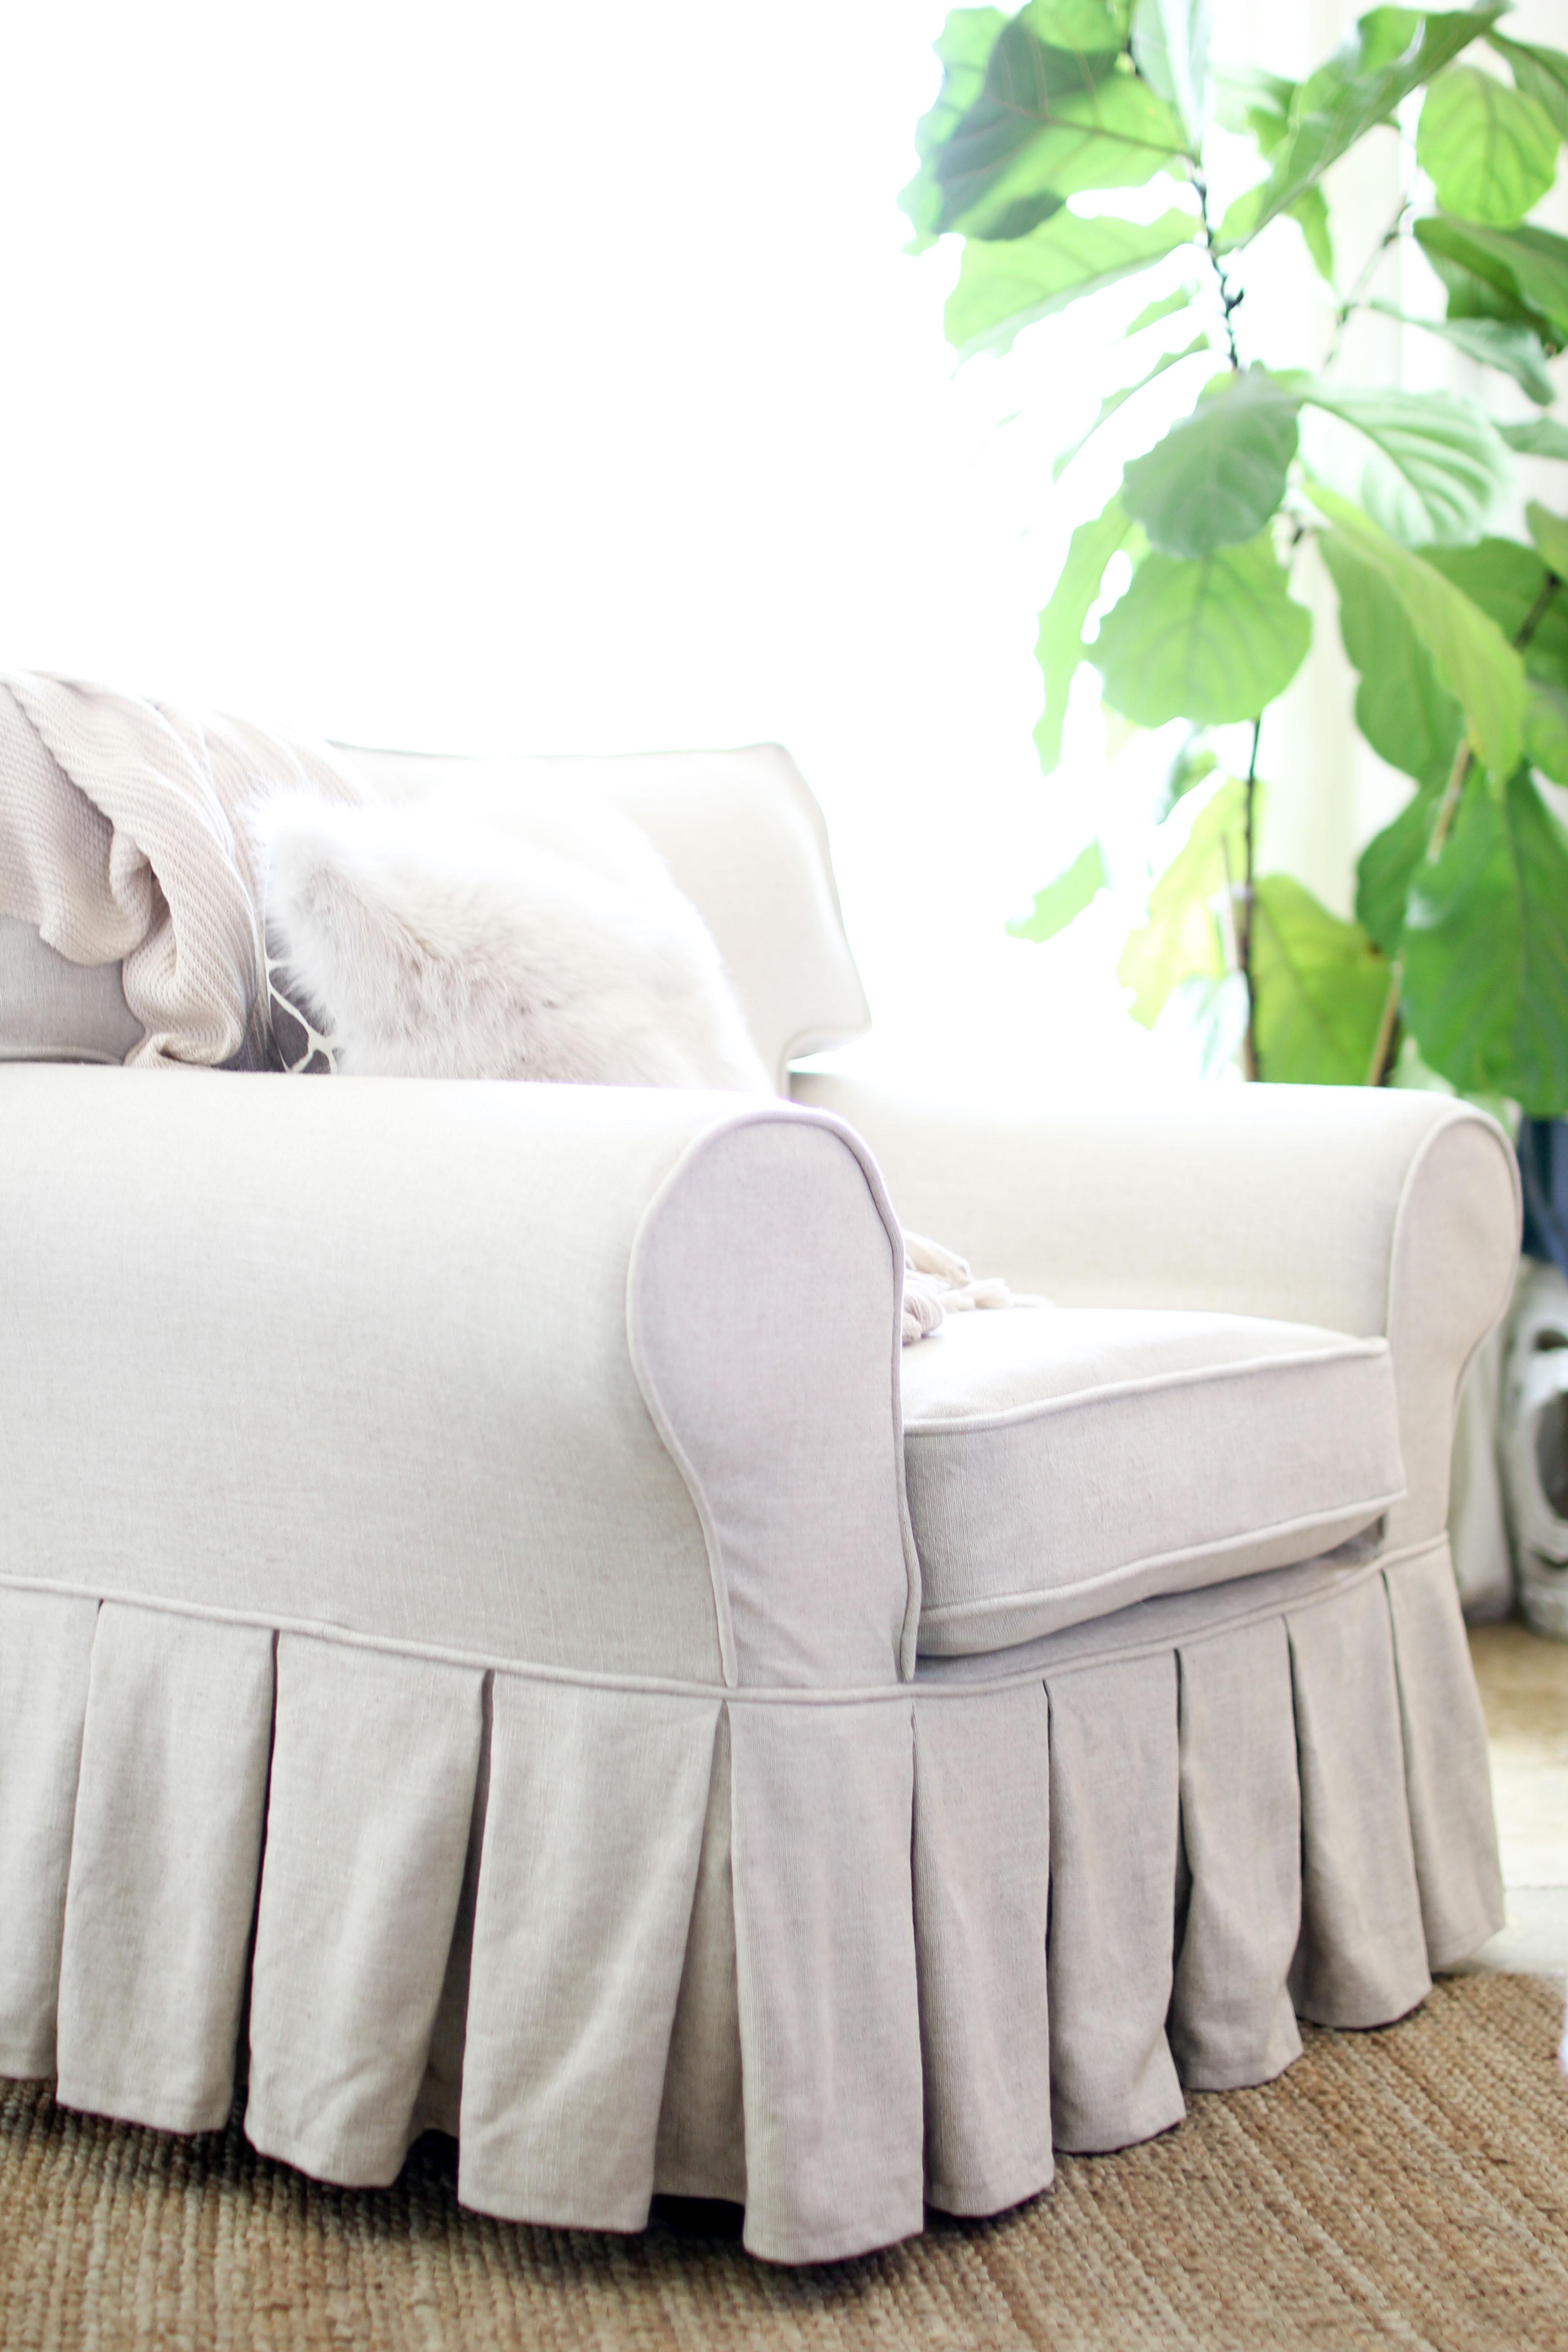 Fodera personalizzata by Comfort Works